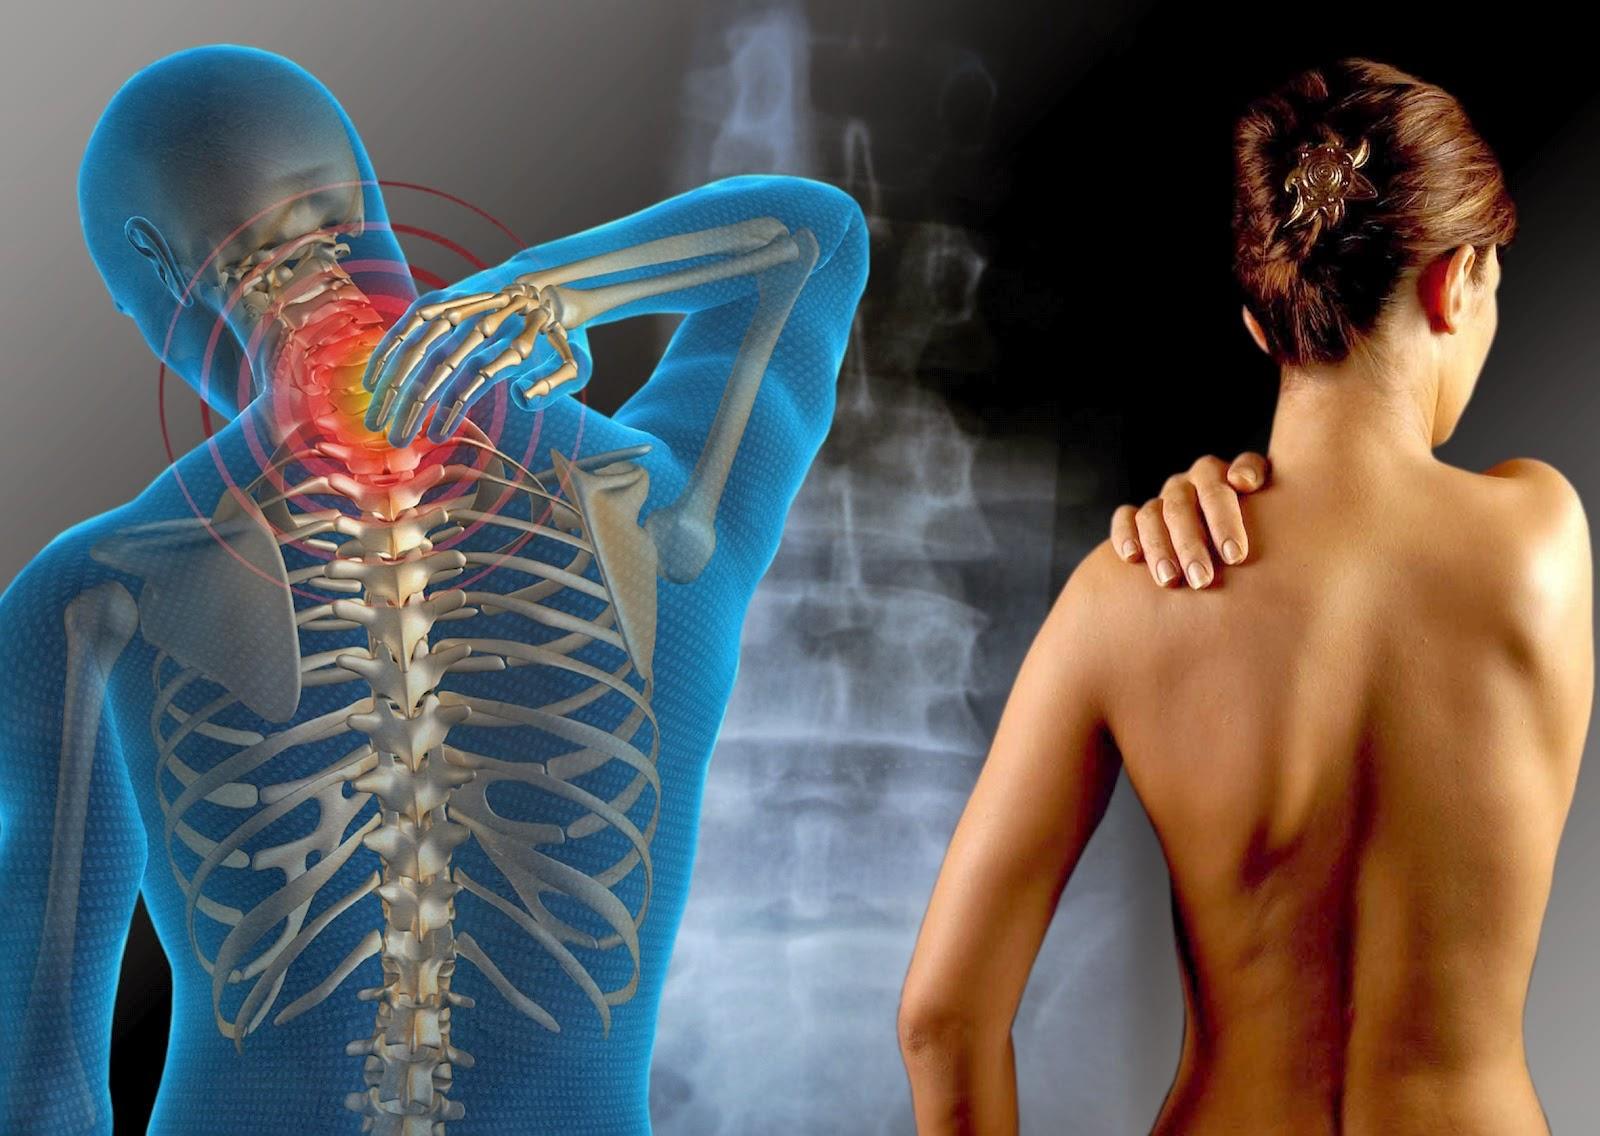 Stop al dolore con l'osteopatia!